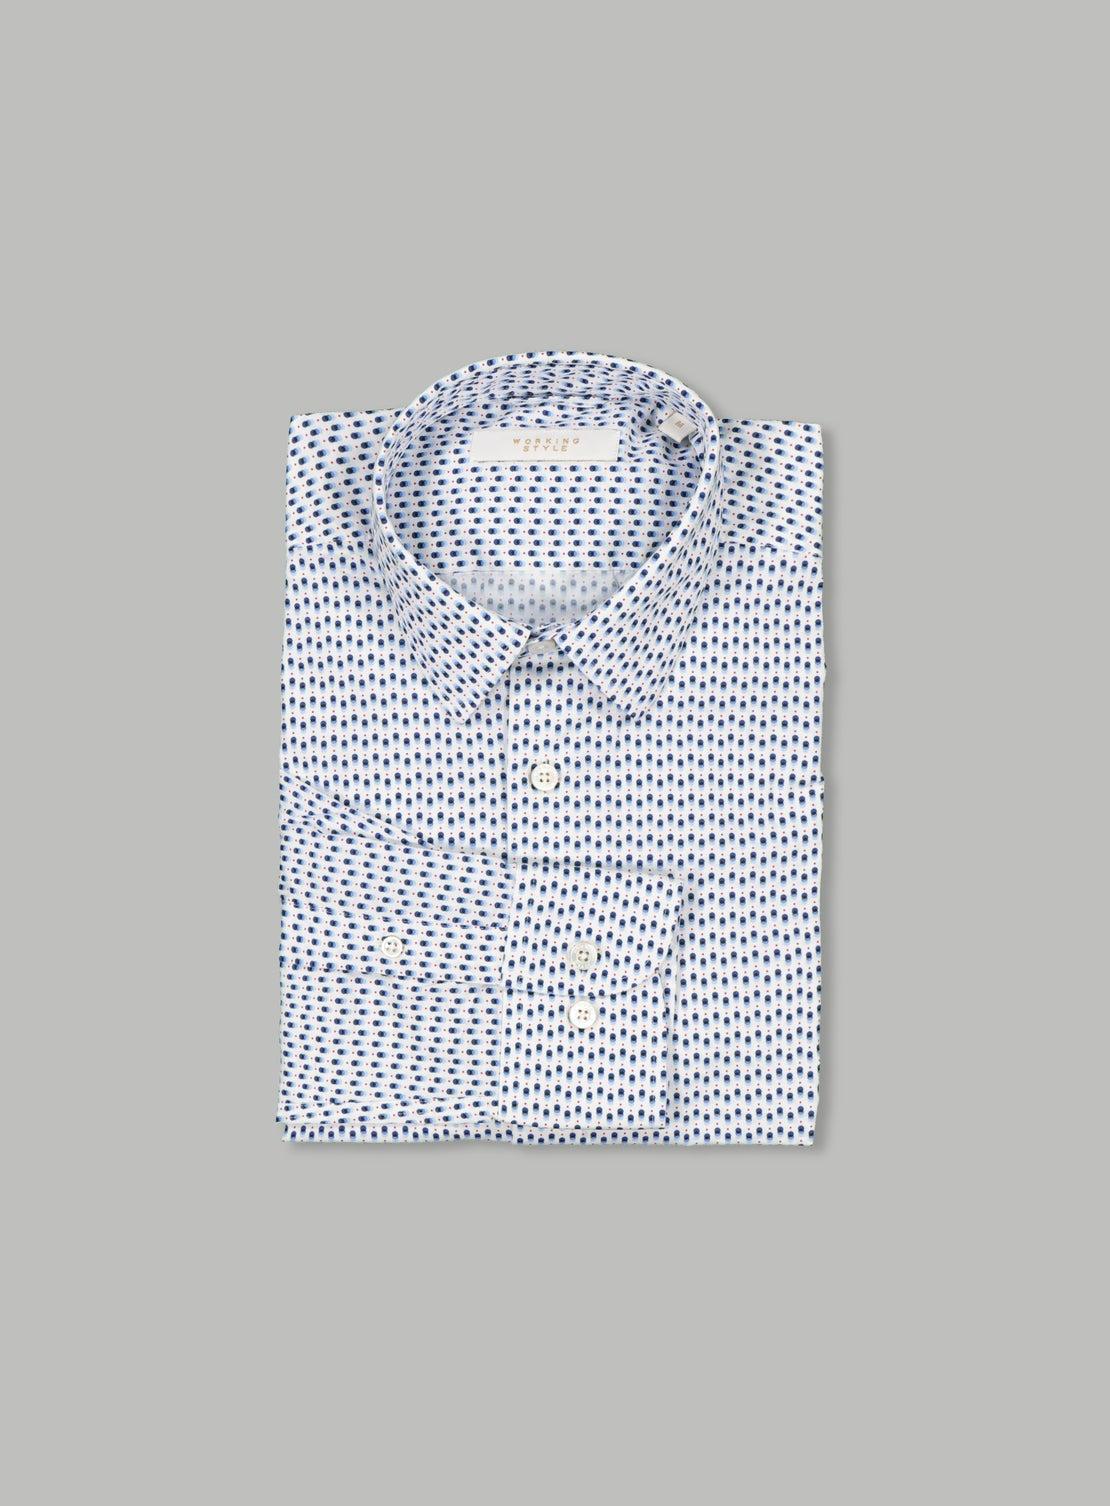 Arcade Teardrop Printed Shirt